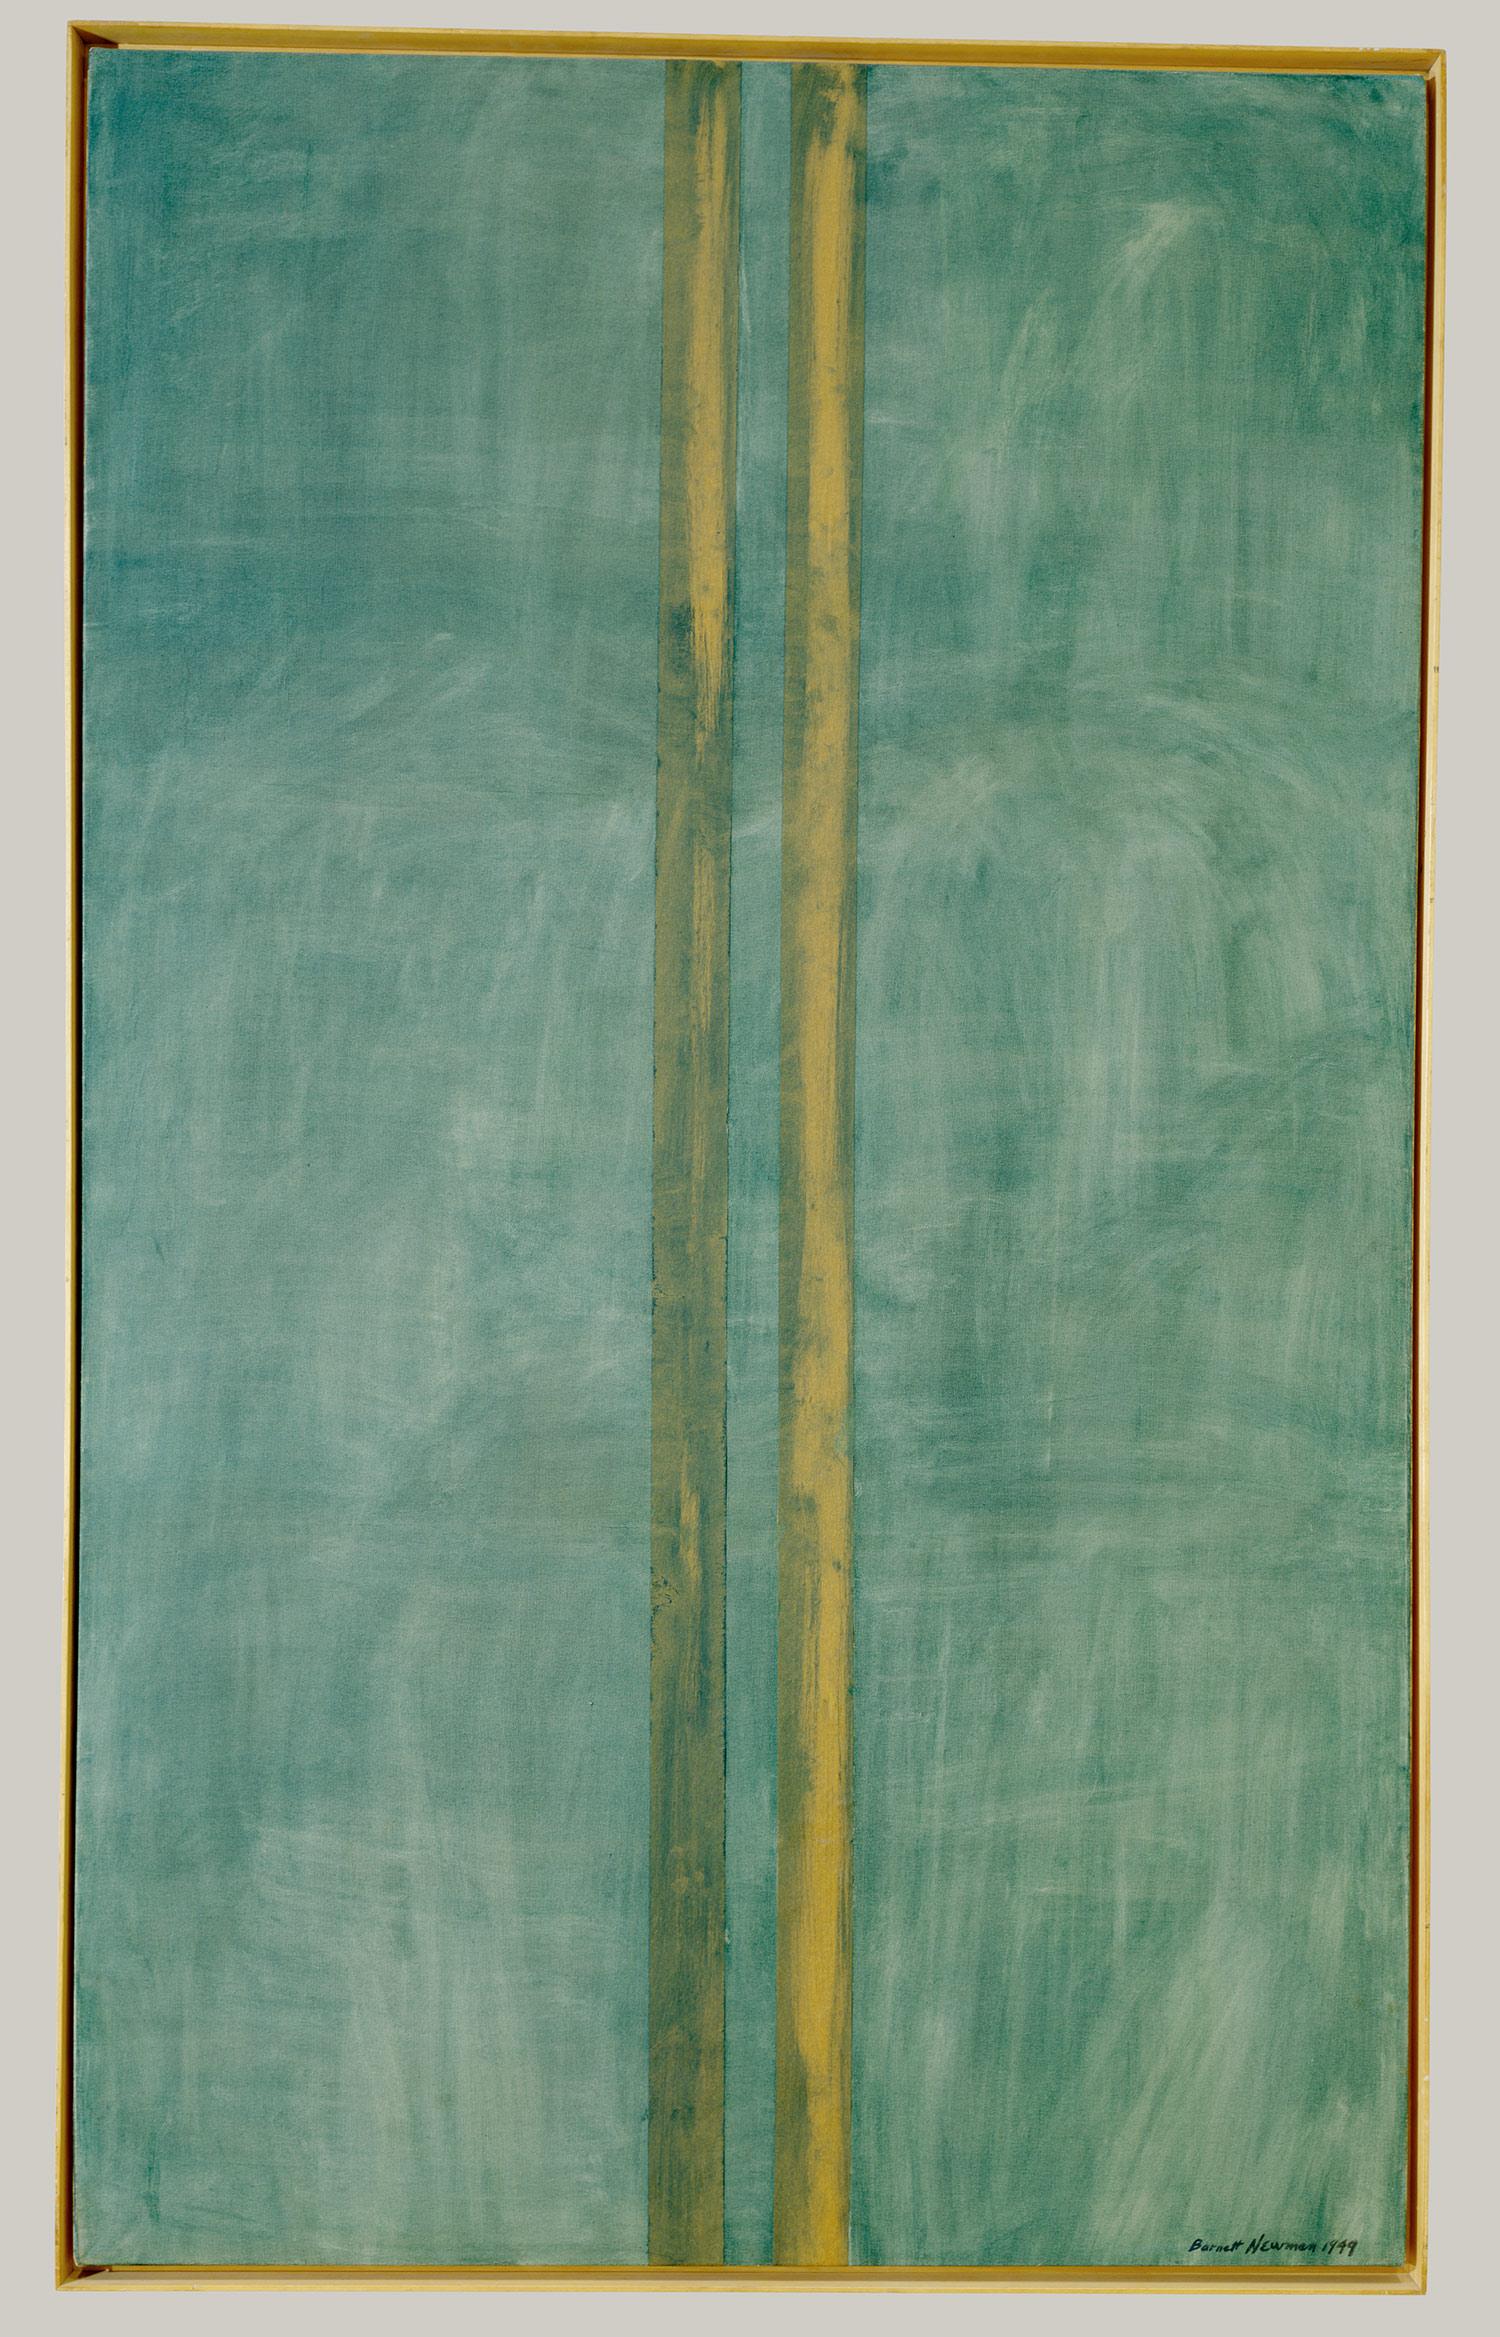 Painting by Barnett Newman 1949